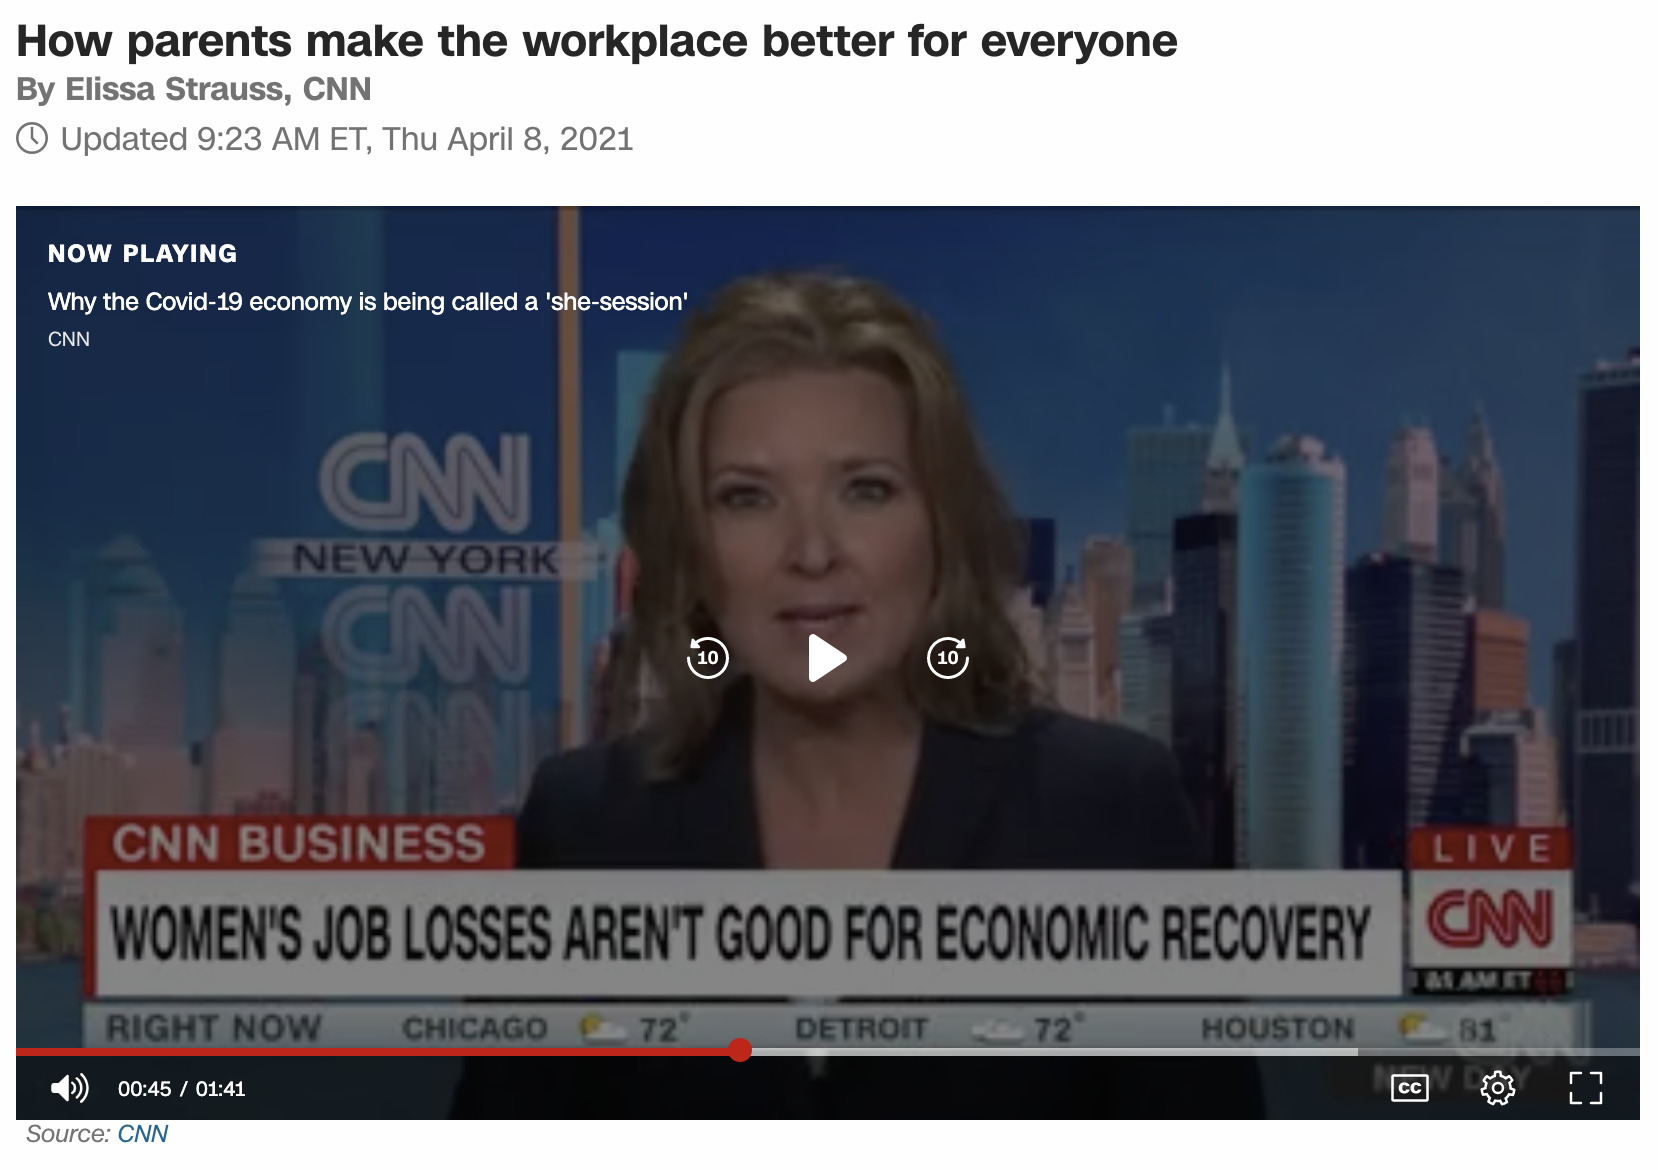 CNN story